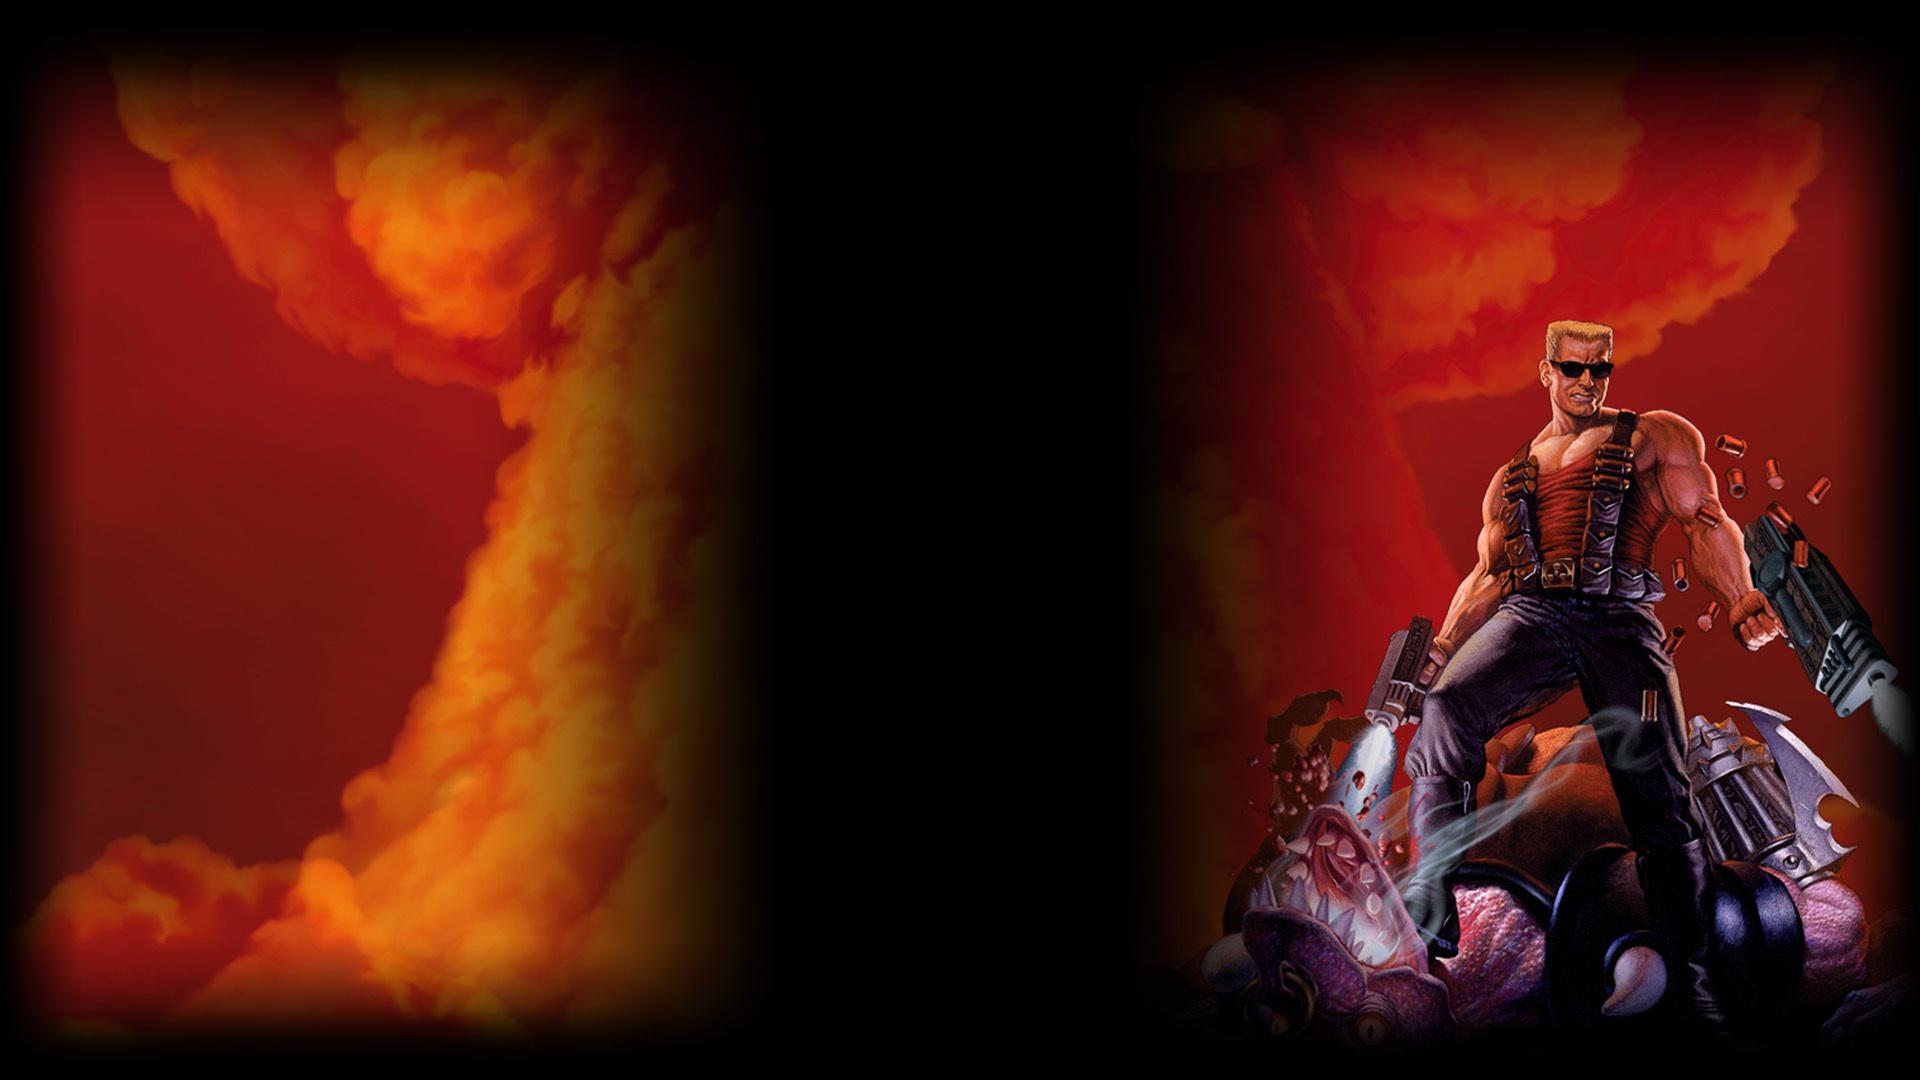 Duke Nukem 3D Megaton Edition Full HD Wallpaper And Background